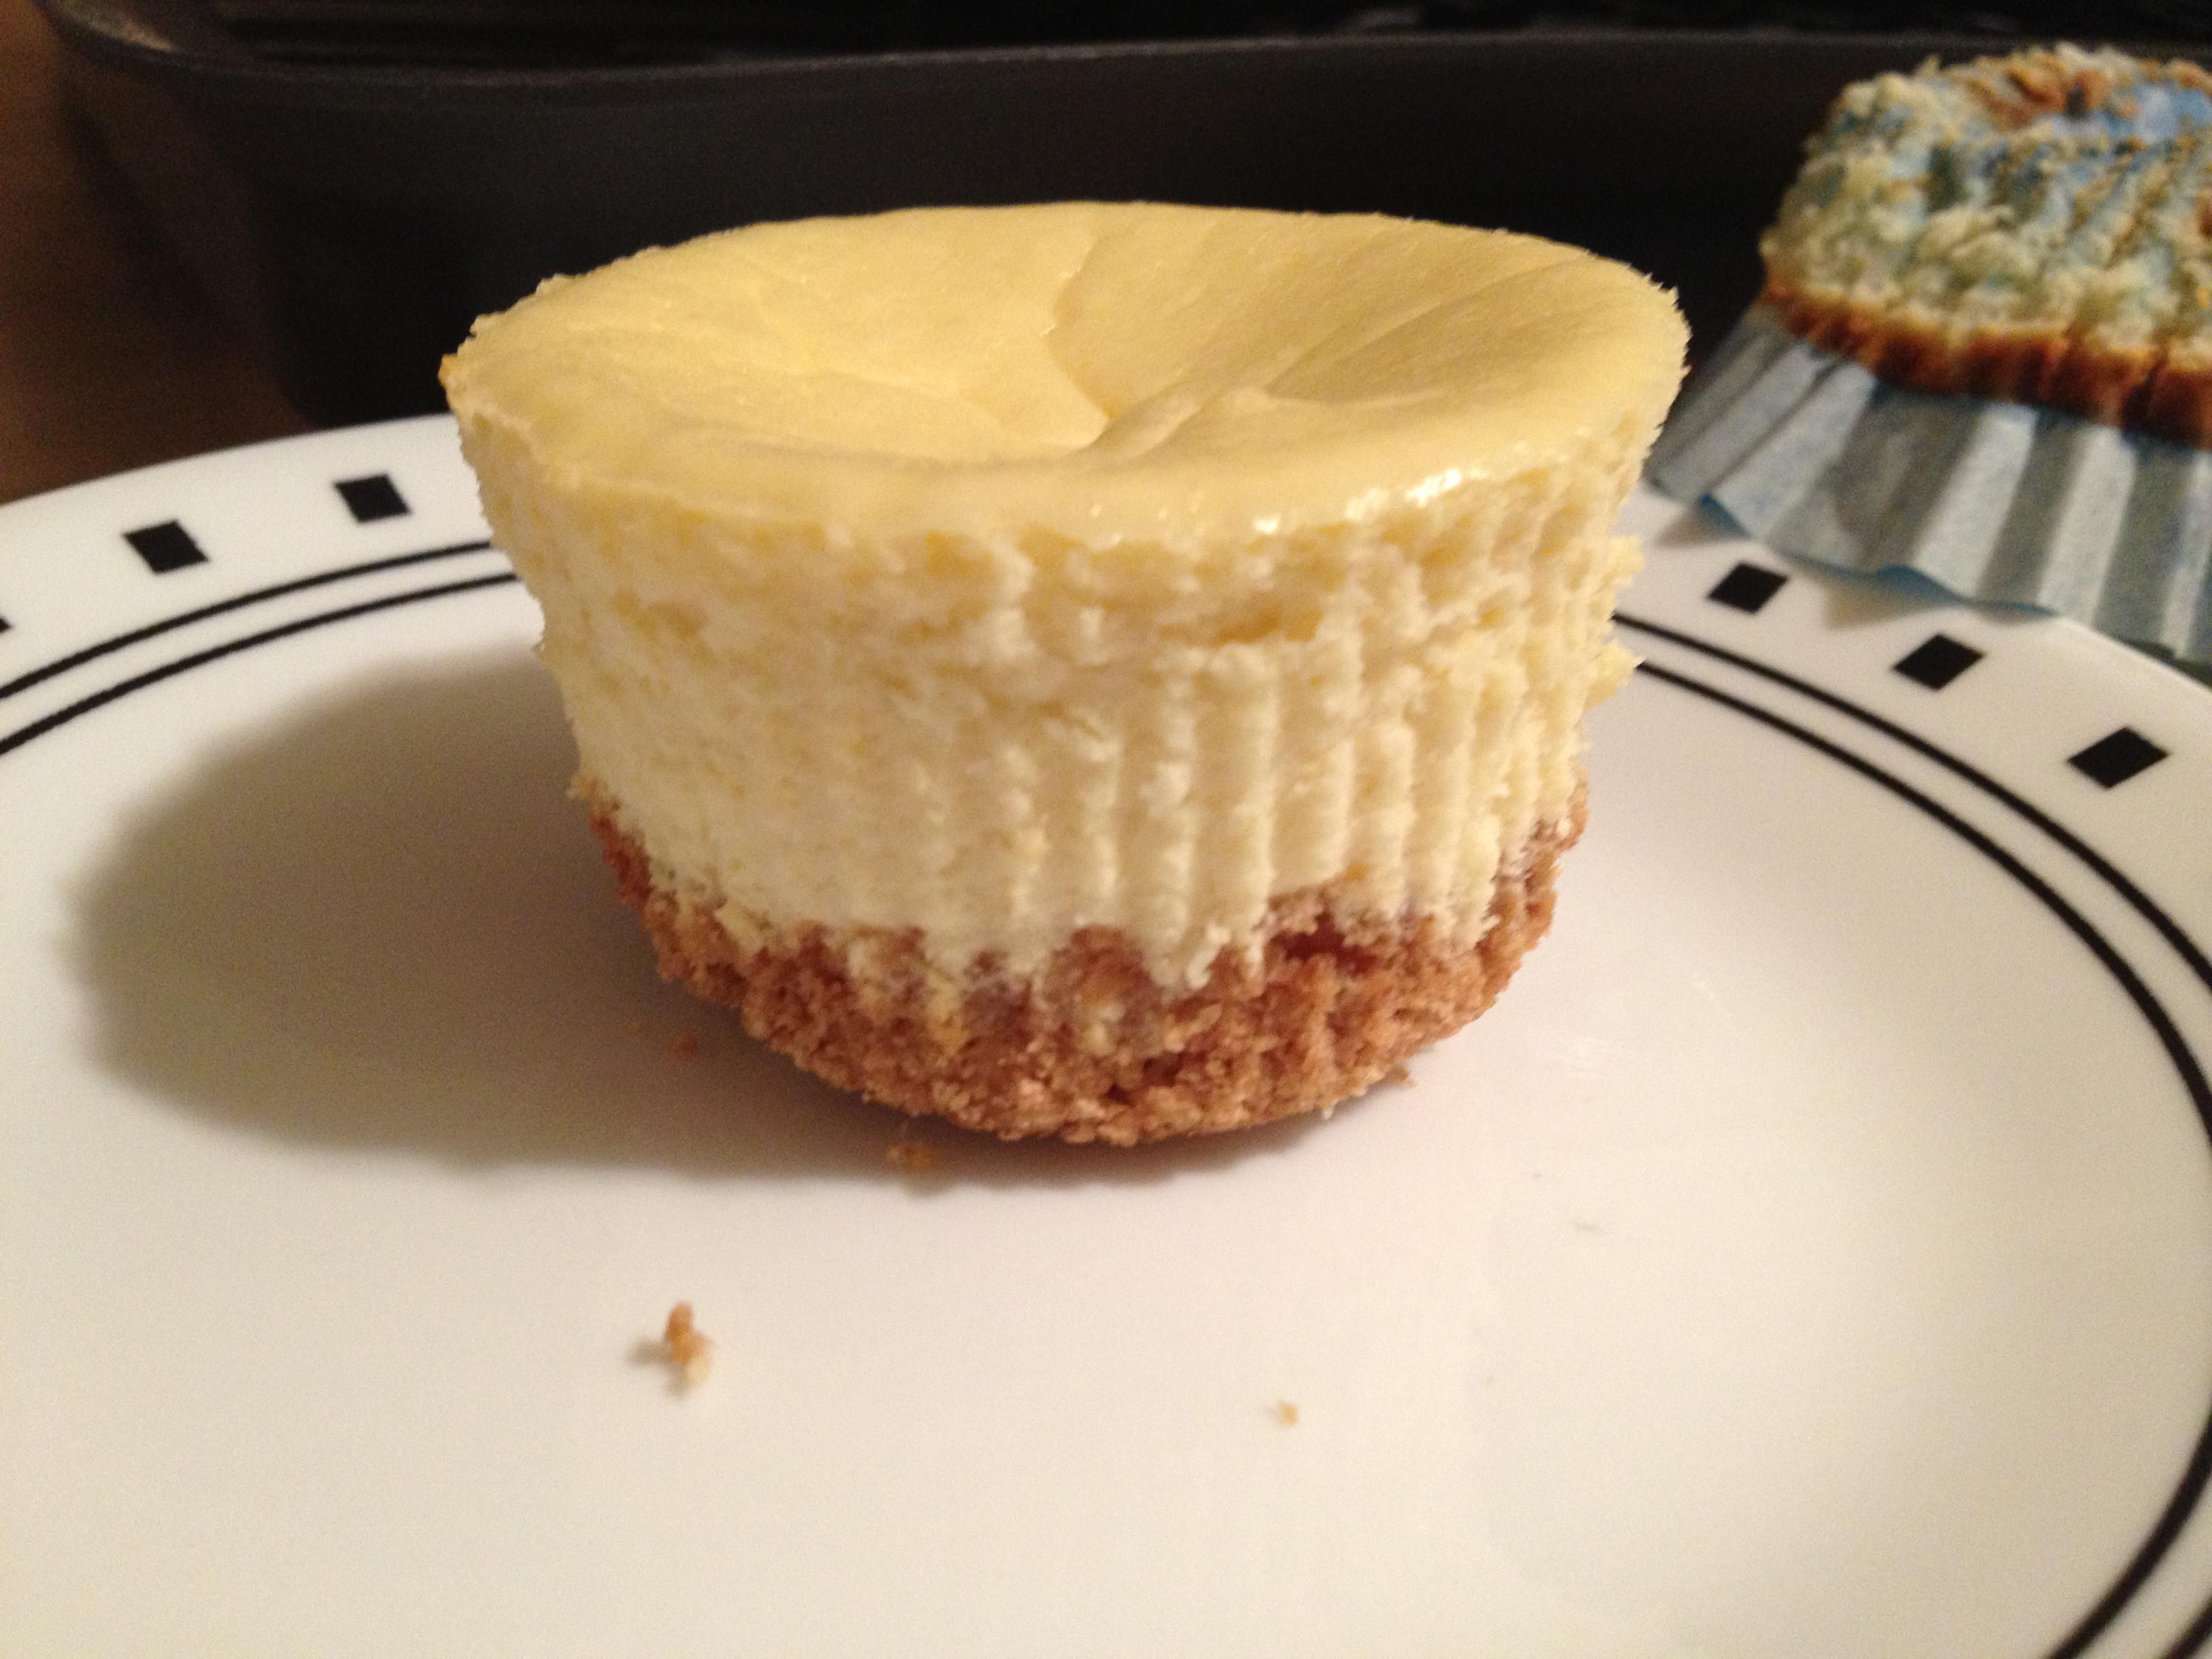 Healthy Greek Yogurt Dessert Recipes  Healthy Greek Yogurt Mini Cheesecake Recipe hungry and fit